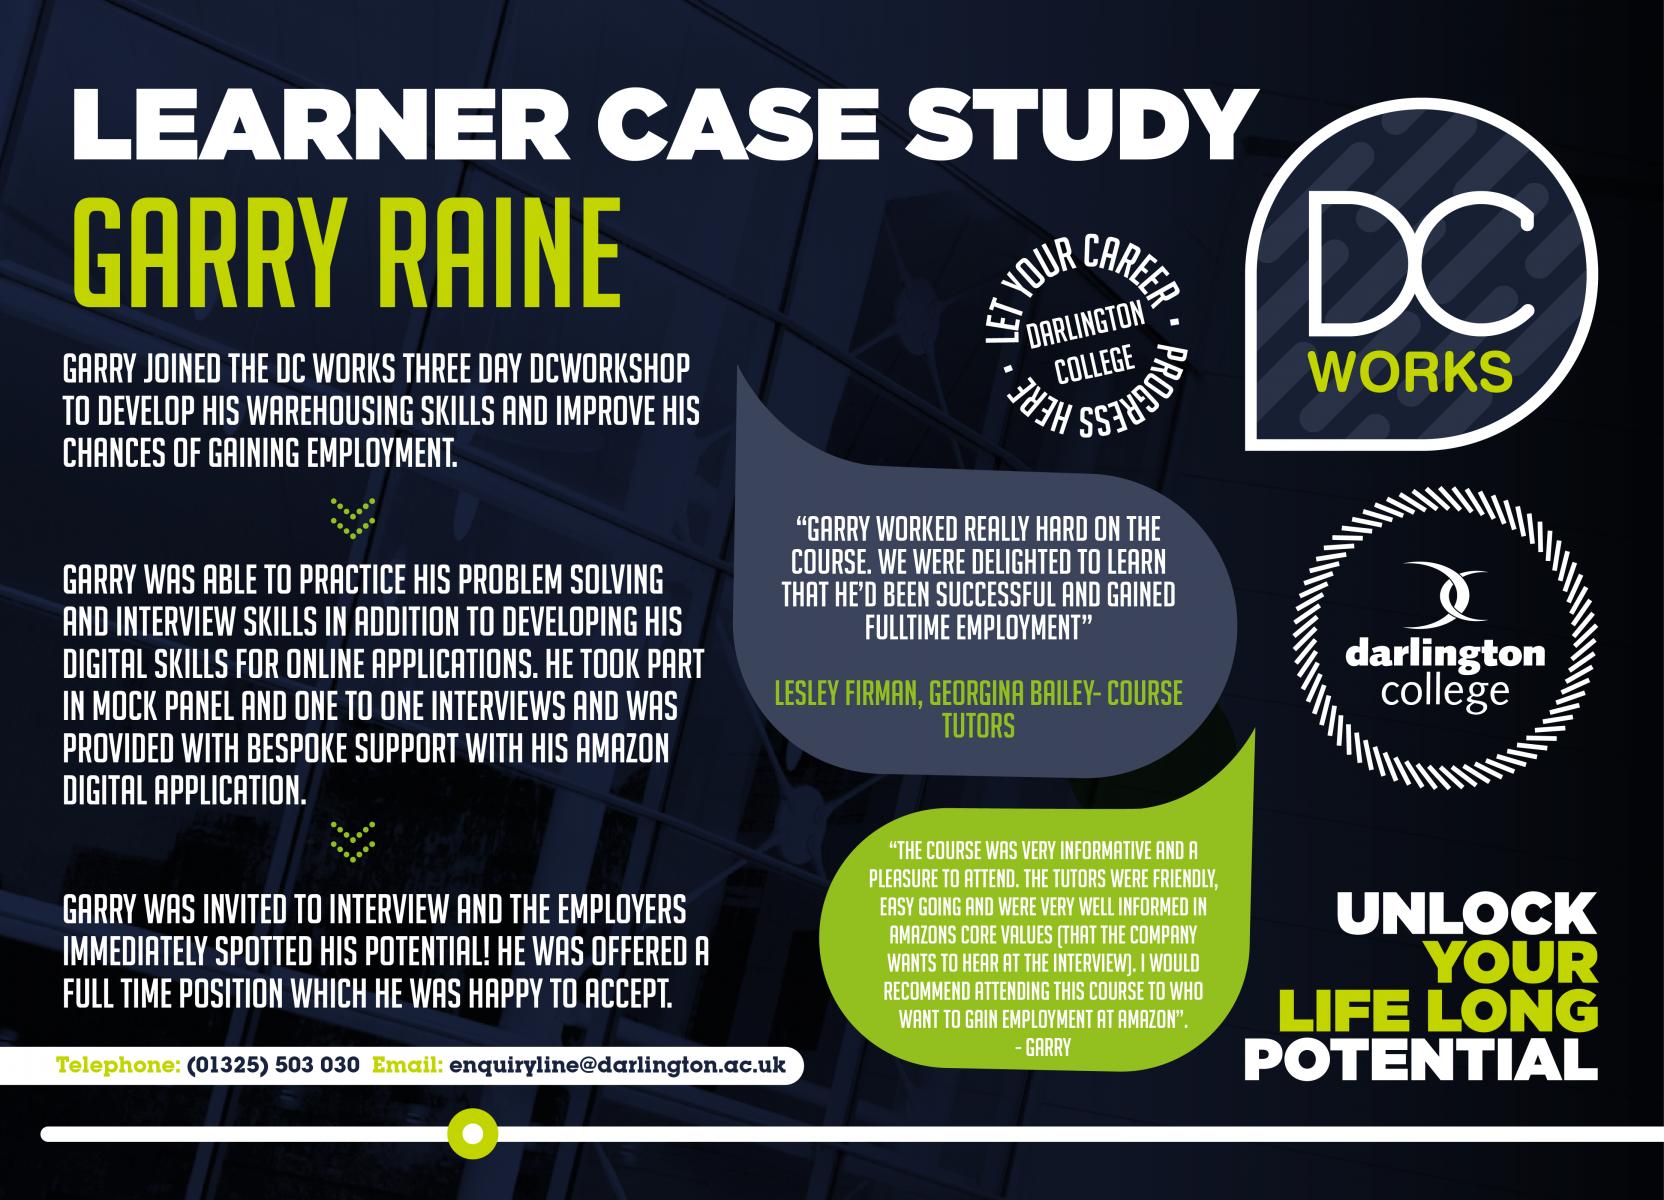 Garry-Raine-Case-Study-01